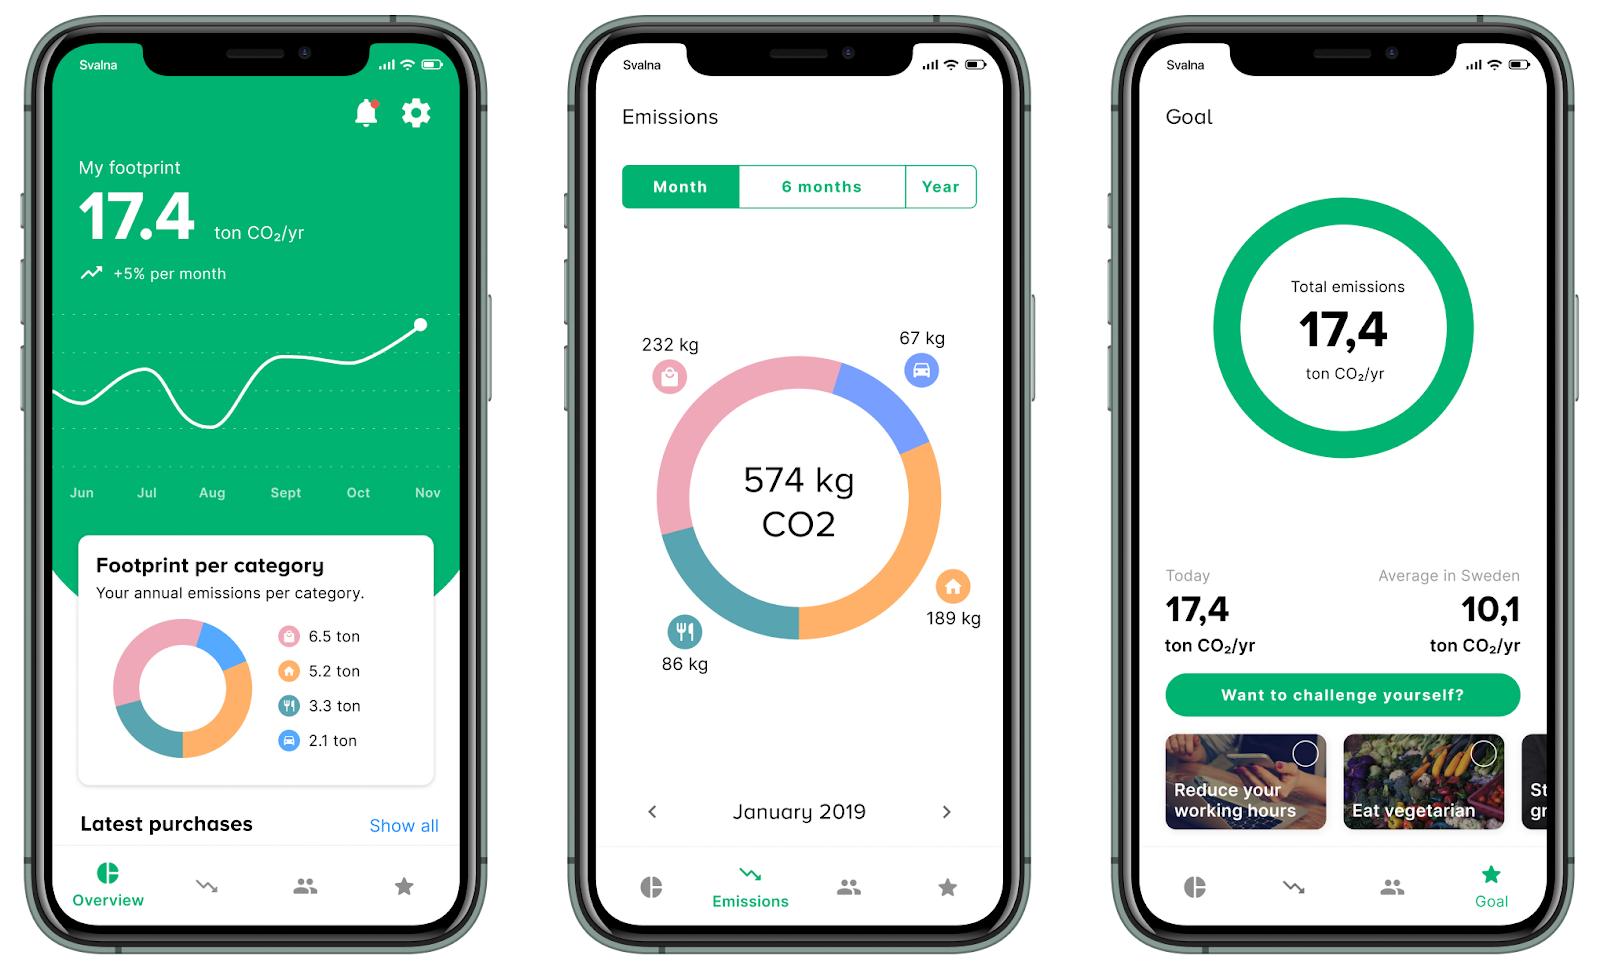 Screenshot of Svalna's app dashboard.